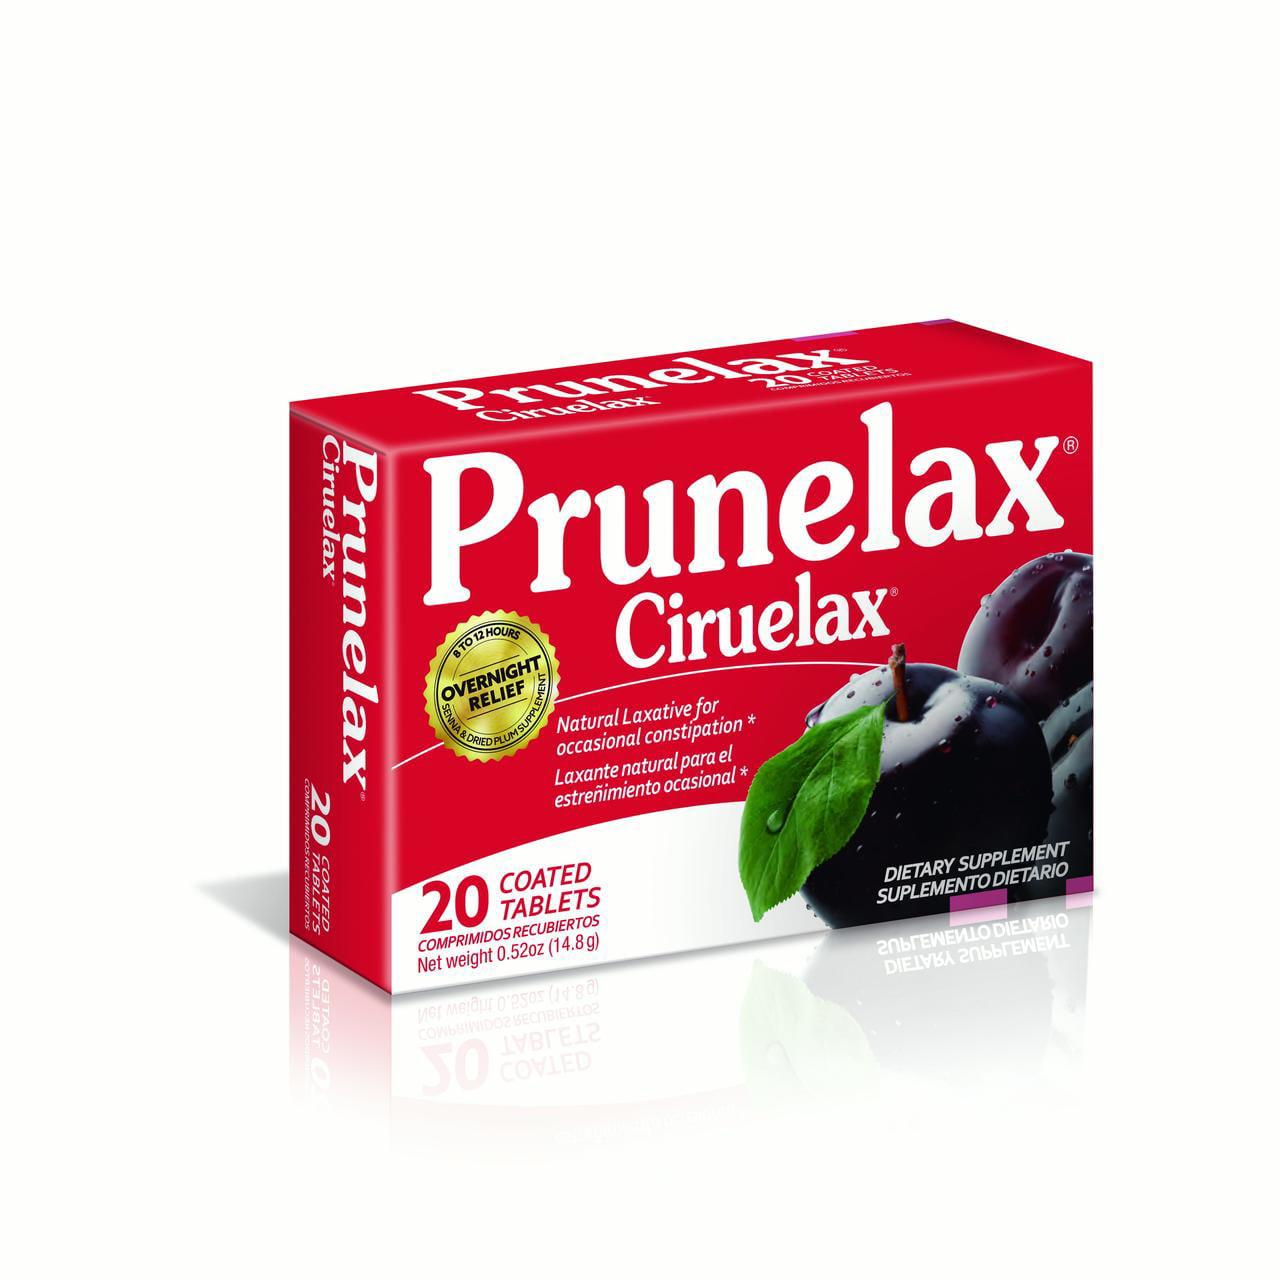 Prunelax Ciruelax Natural Laxative Dietary Supplement Tablets, 20 Ct